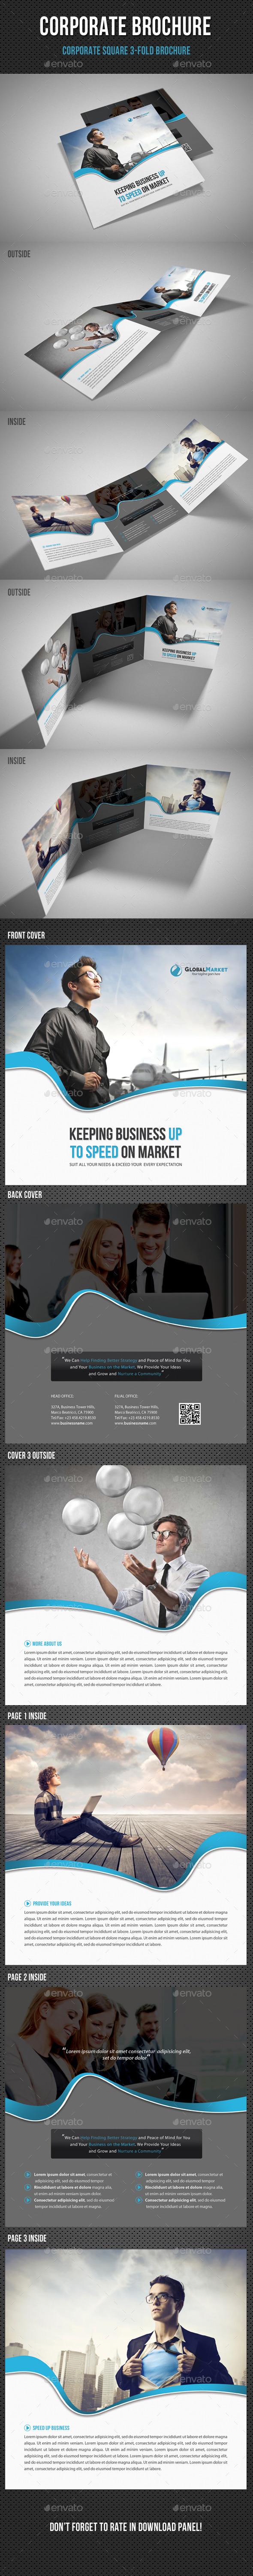 GraphicRiver Corporate Business Square 3-Fold Brochure V02 11410285